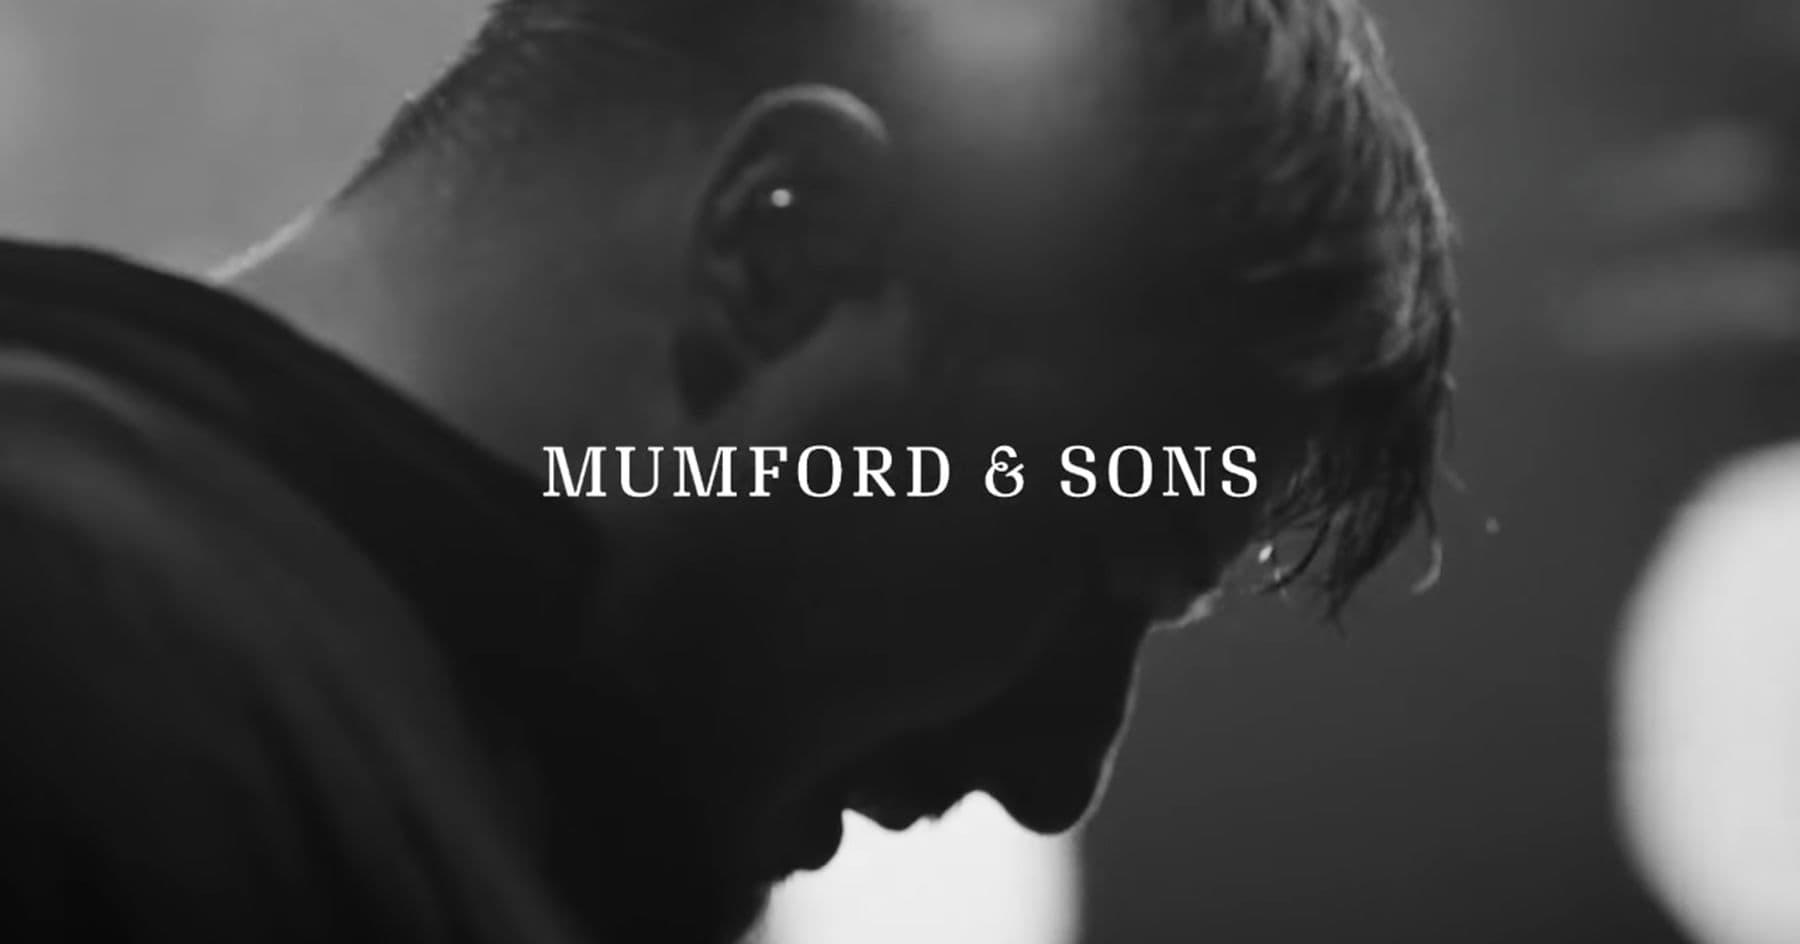 Mumford & Sons - Blind Leading The Blind | Musik | Was is hier eigentlich los?